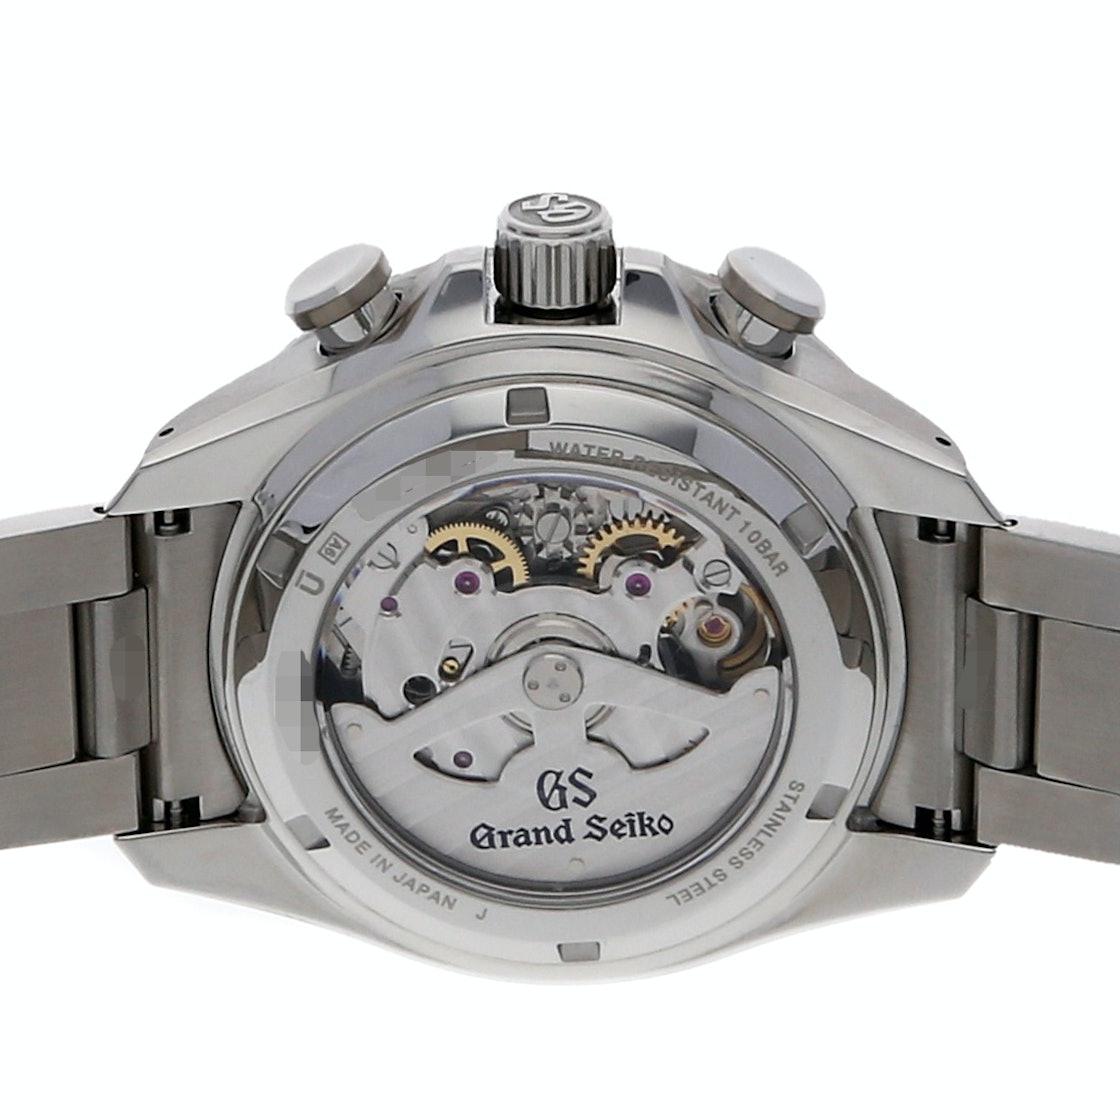 Grand Seiko Chronograph SBGB003